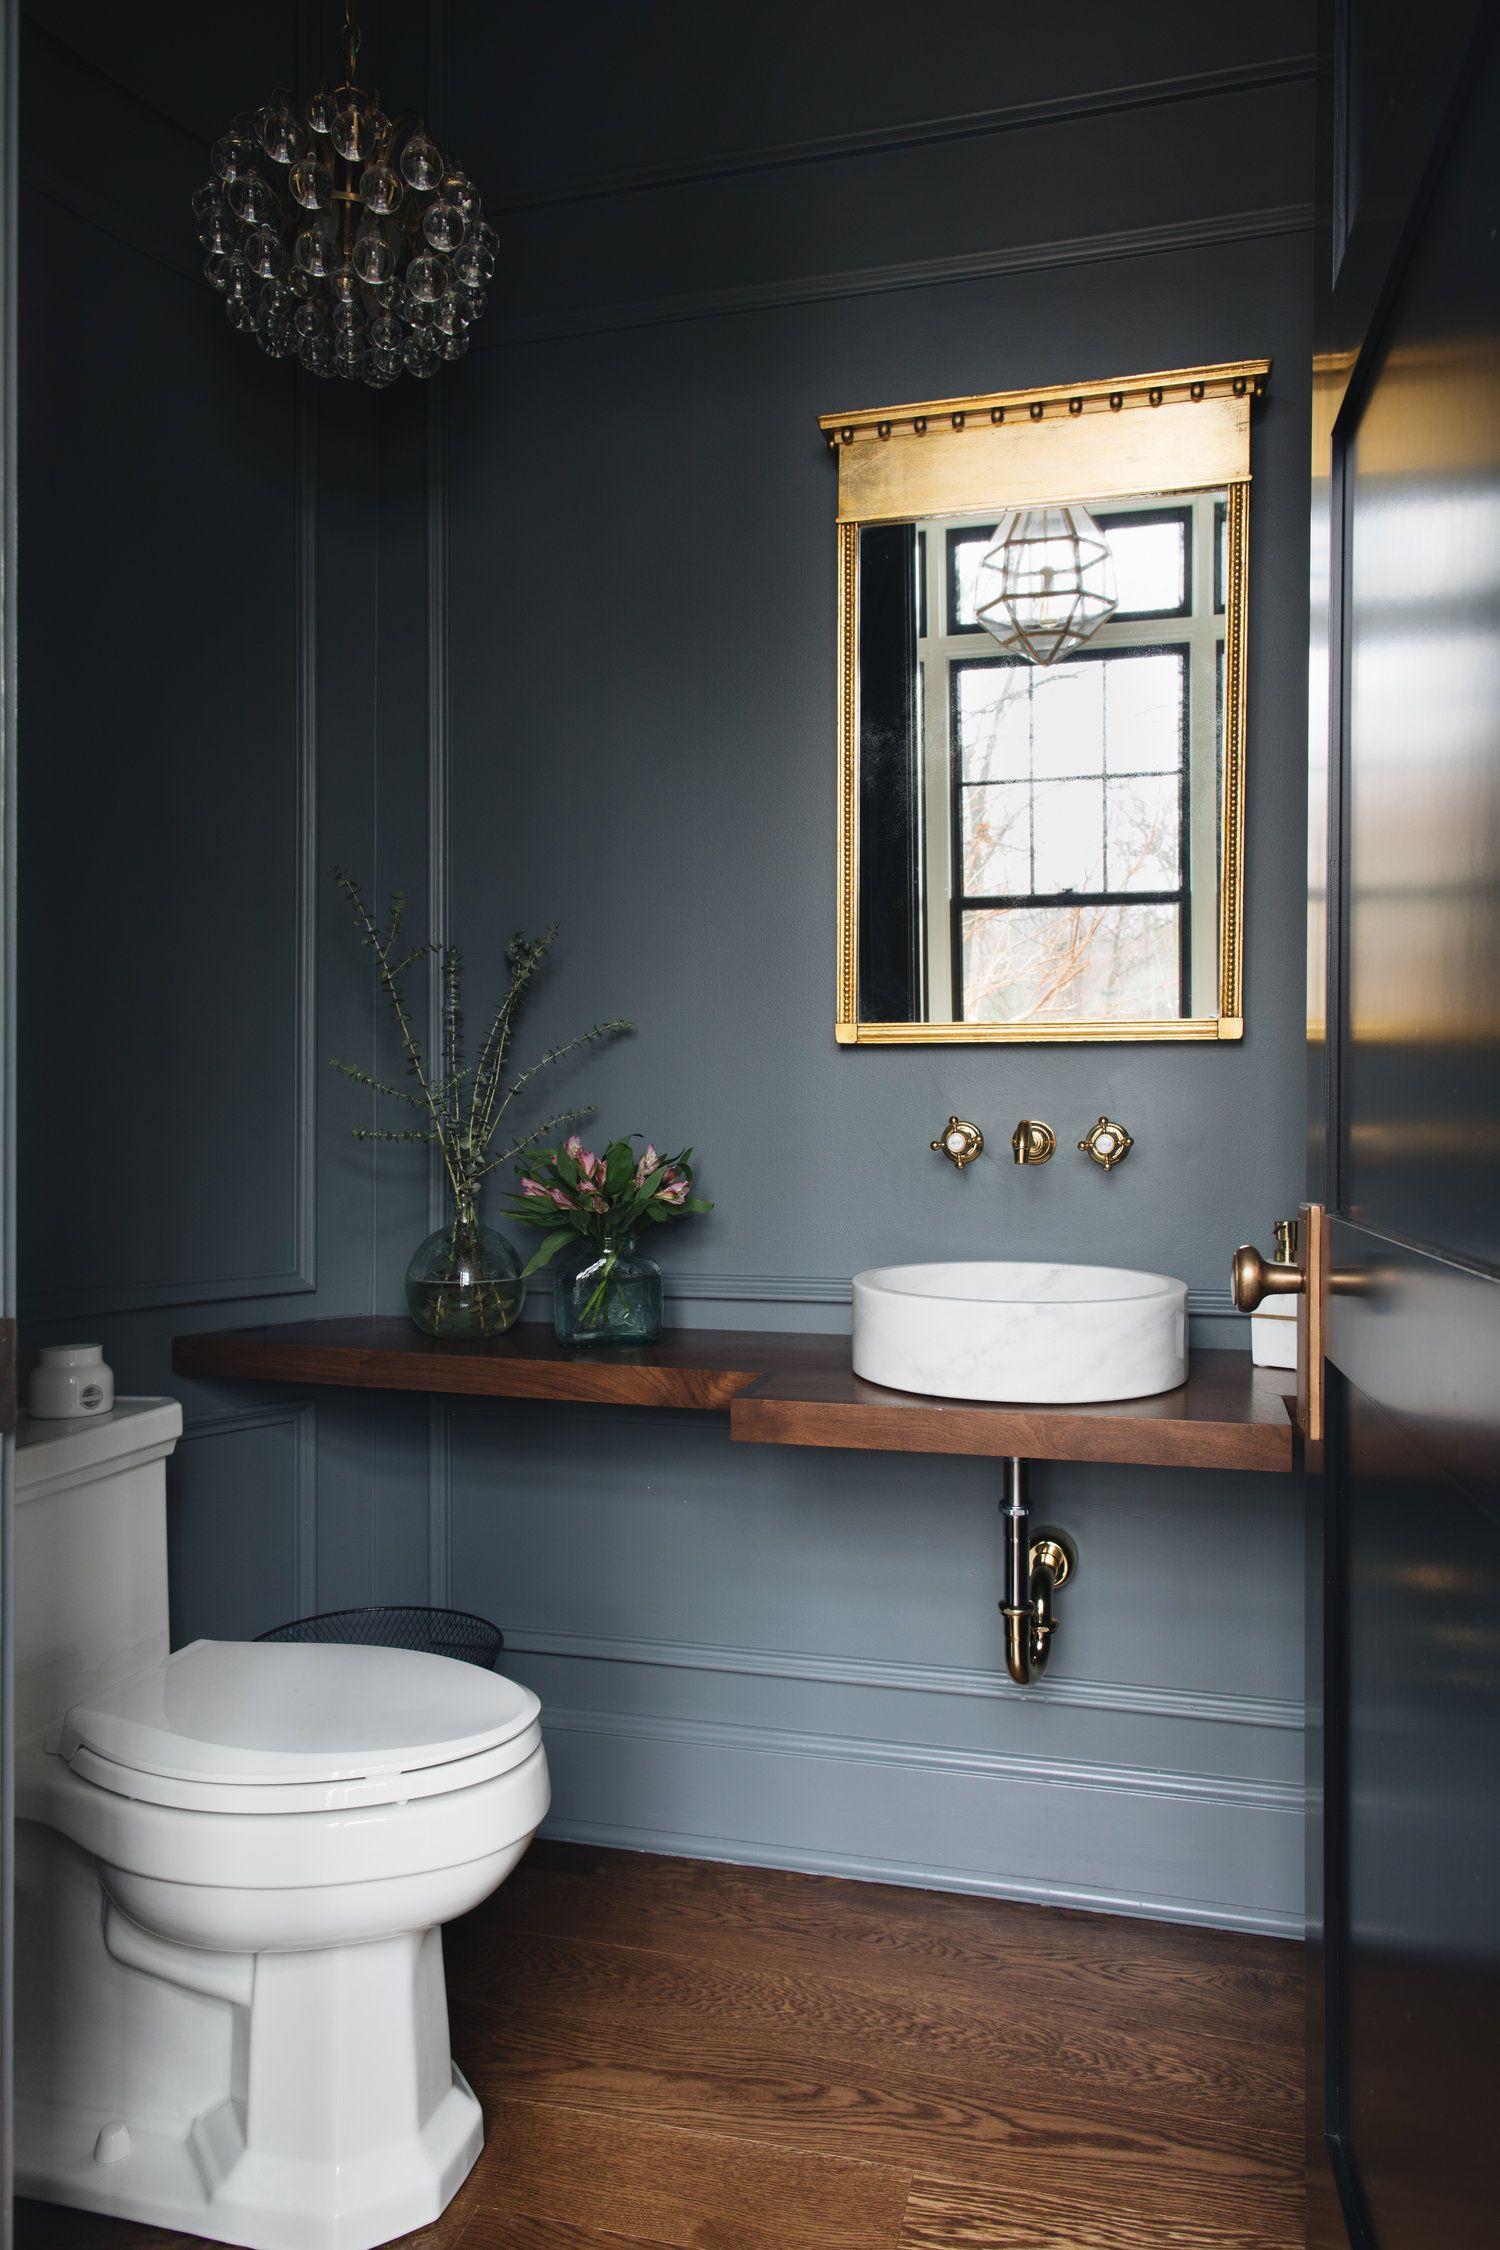 410 Bathroom Ideas In 2021 Beautiful Bathrooms Decor Design